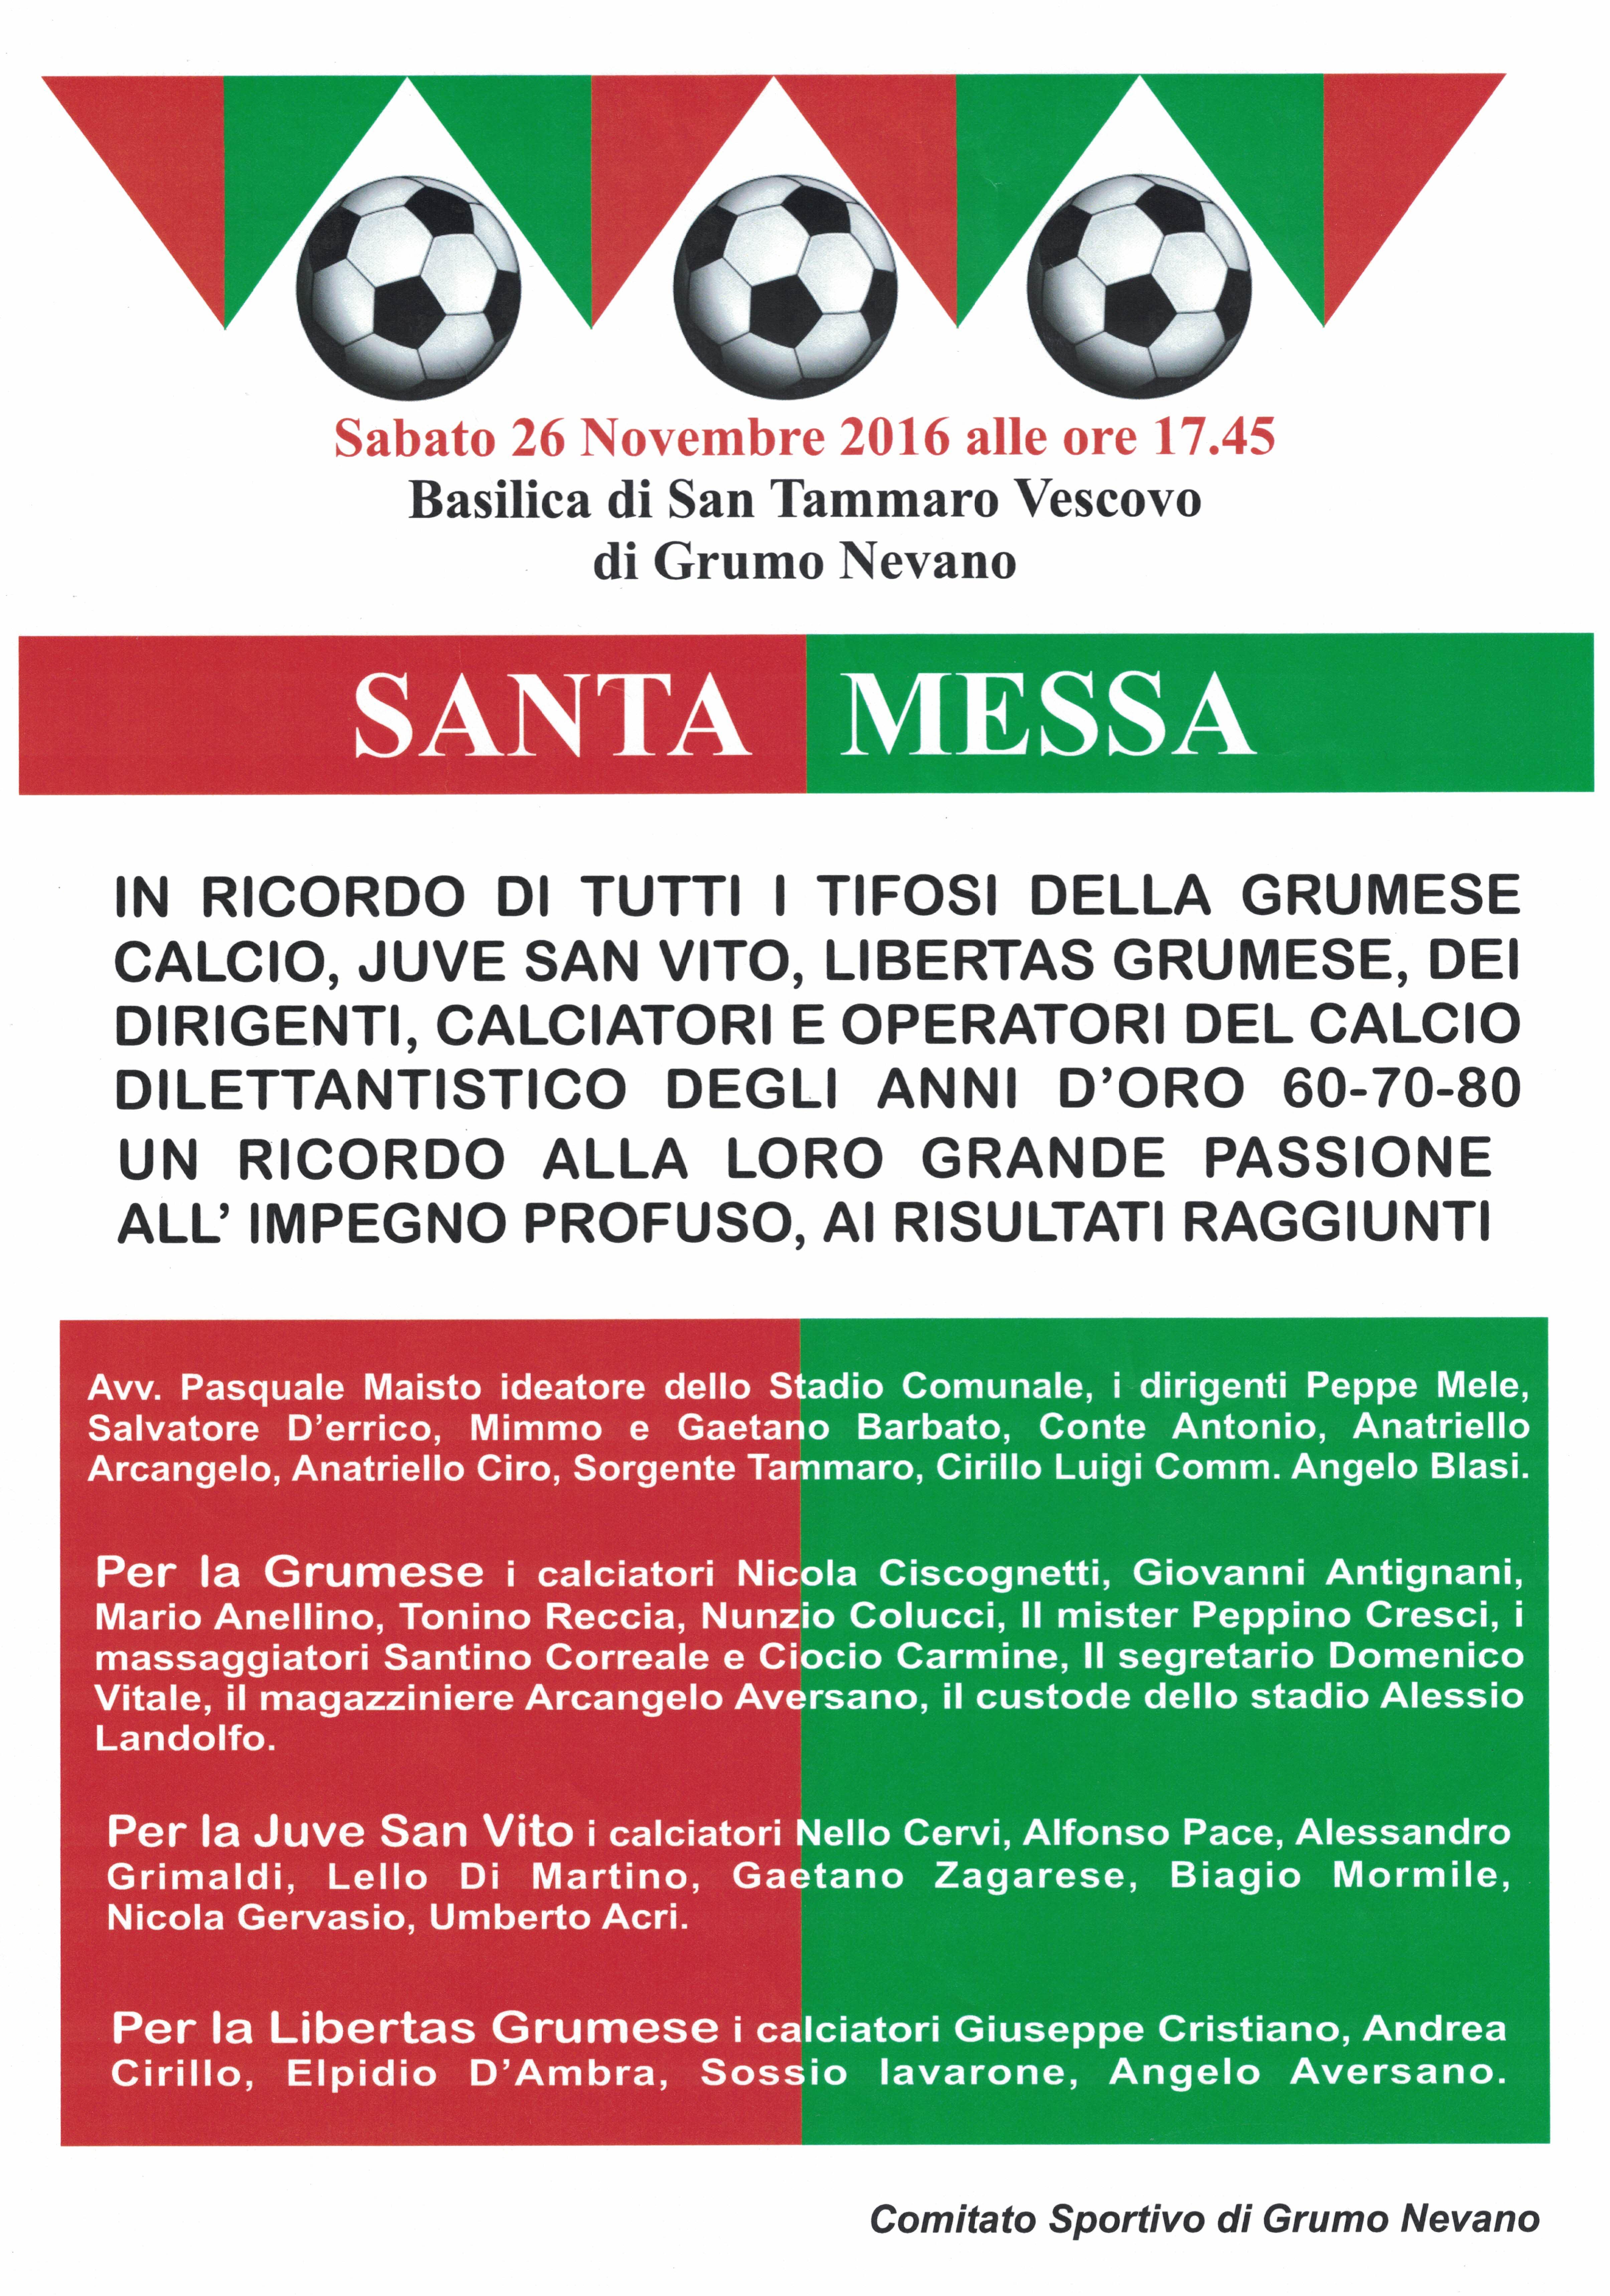 messa-calciatori-2016-locandina